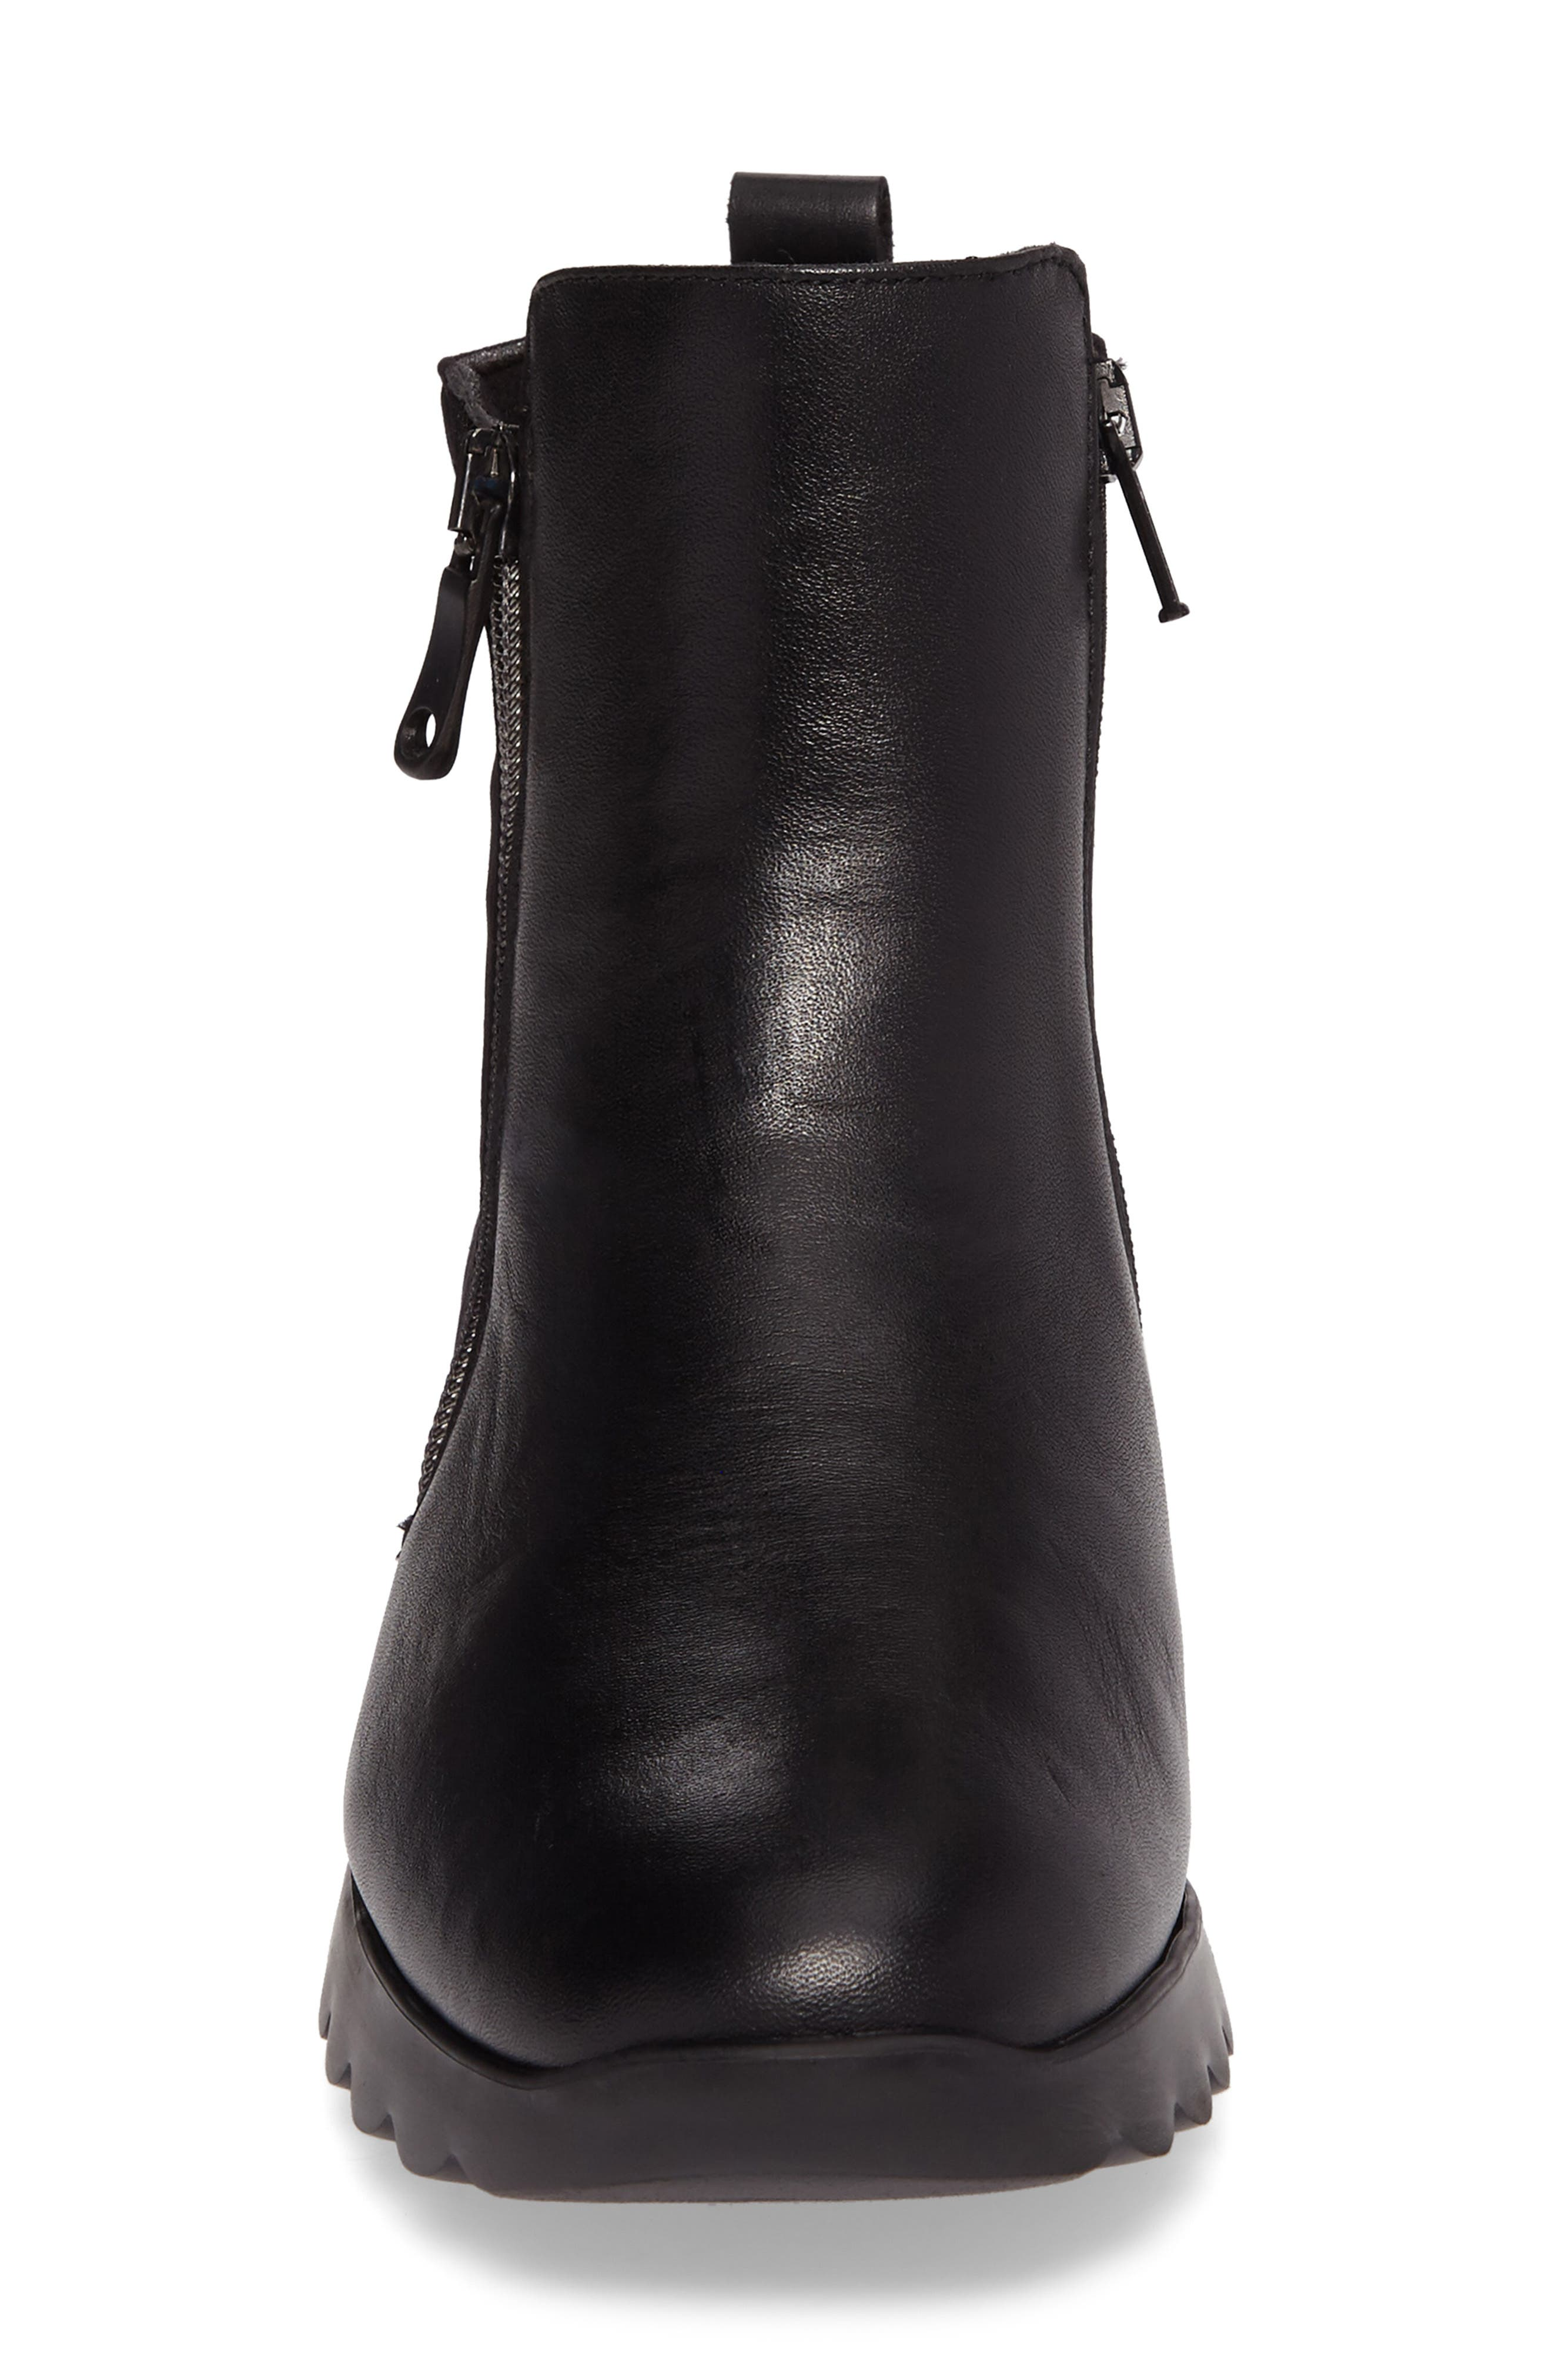 Ashcroft Bootie,                             Alternate thumbnail 4, color,                             Black Leather